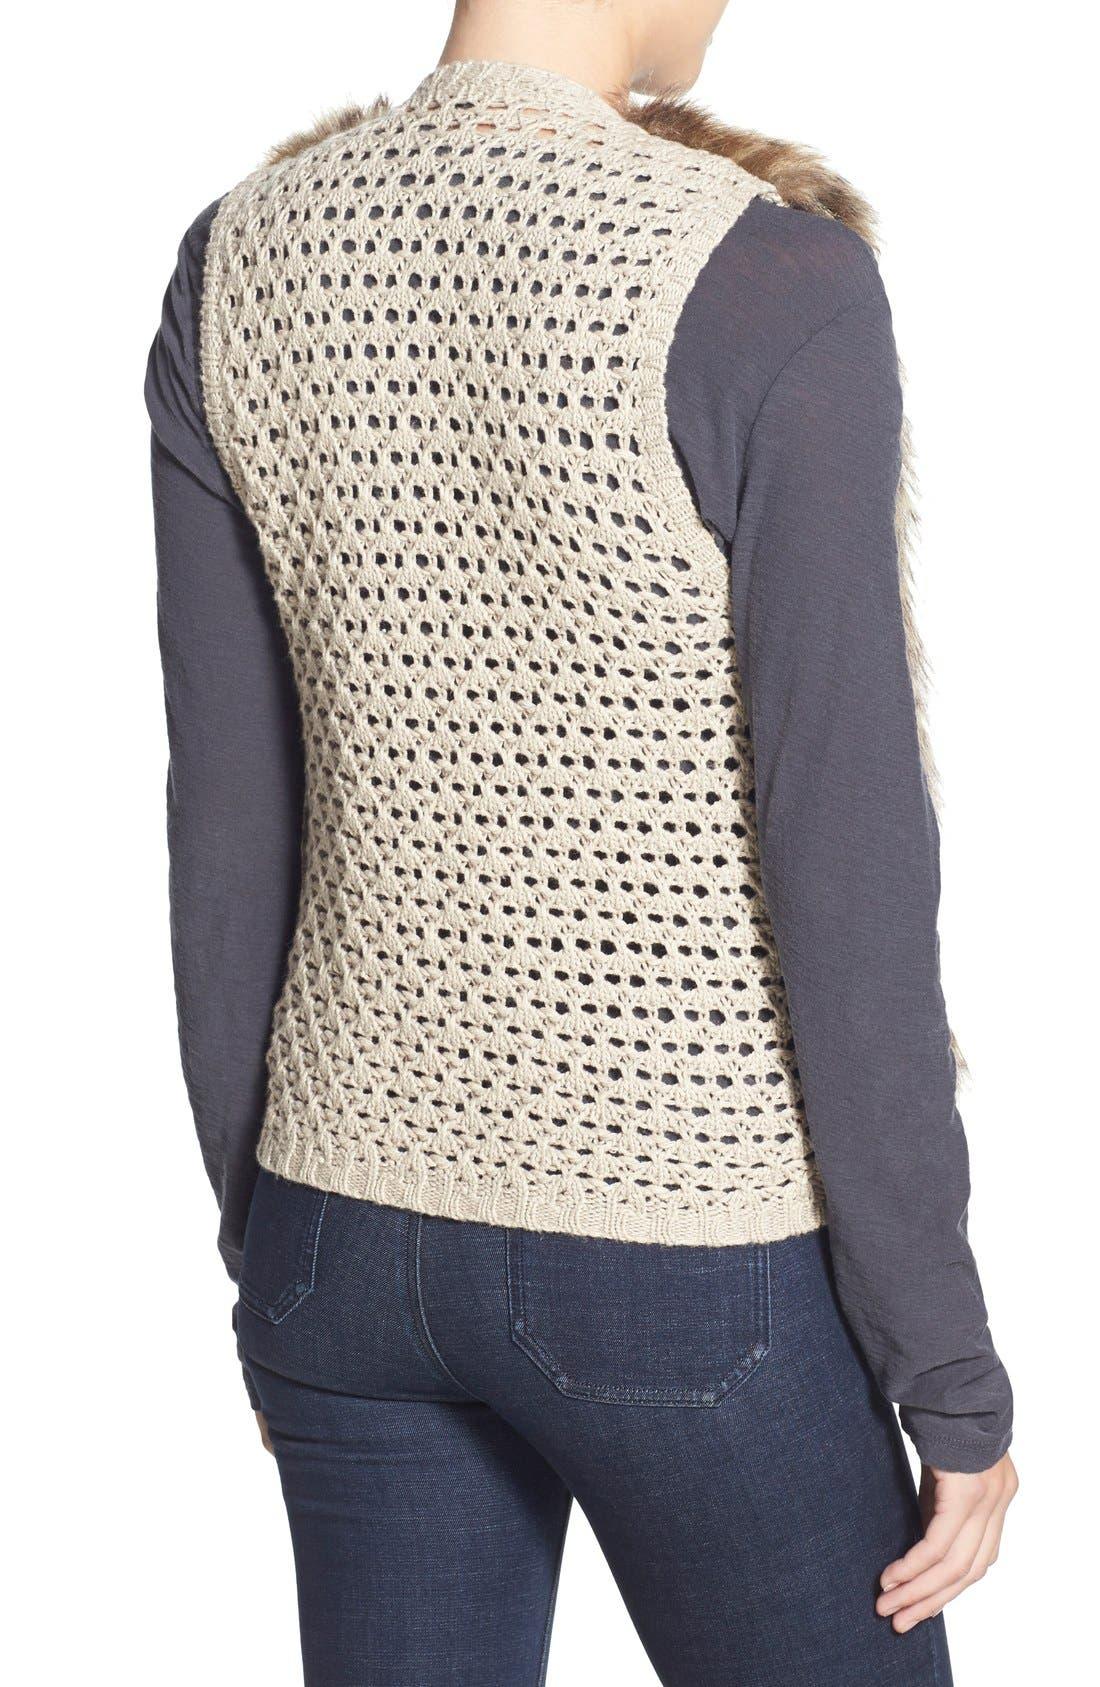 Alternate Image 2  - Ella Moss 'Lyla' Faux Fur Knit Back Vest